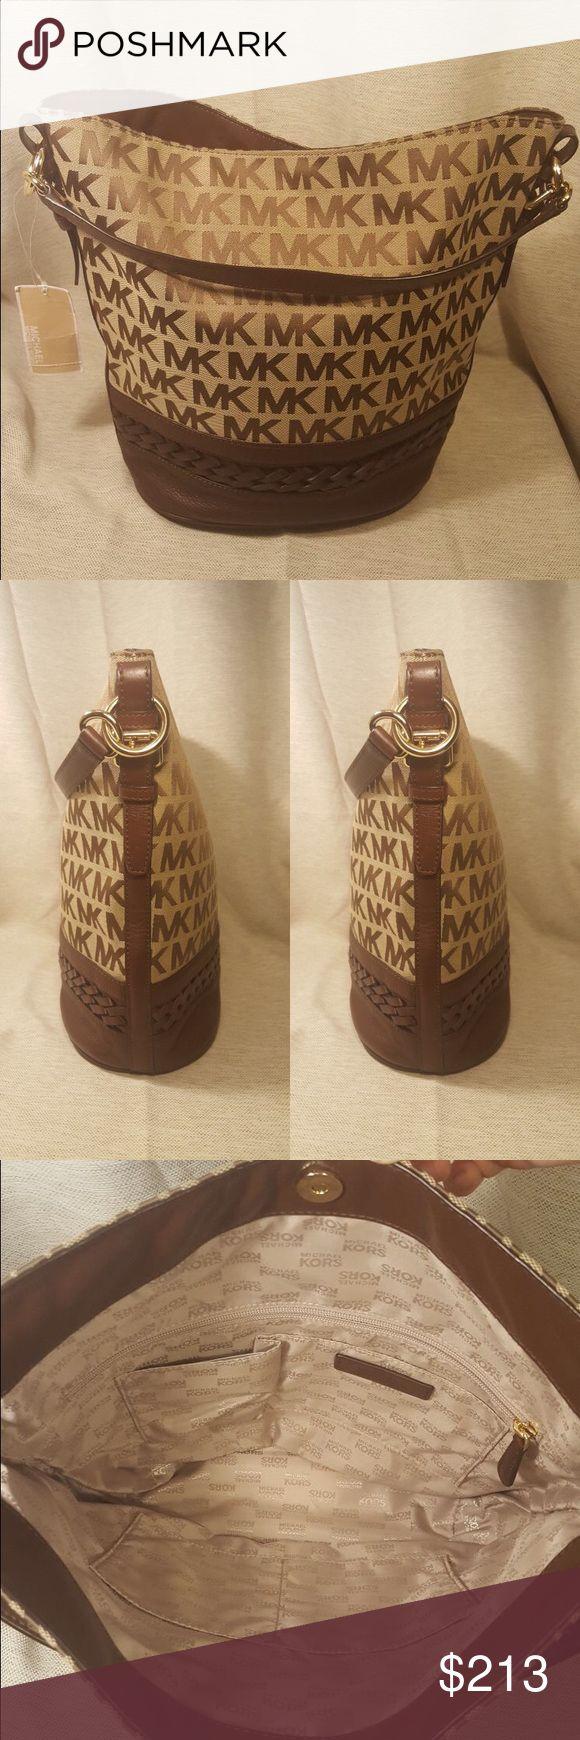 BRAND NEW Michael Kors Gladstone Bucket Purse NWT Michael Kors Gladstone Handbag. Retails for $328. Make me an offer :) MICHAEL Michael Kors Bags